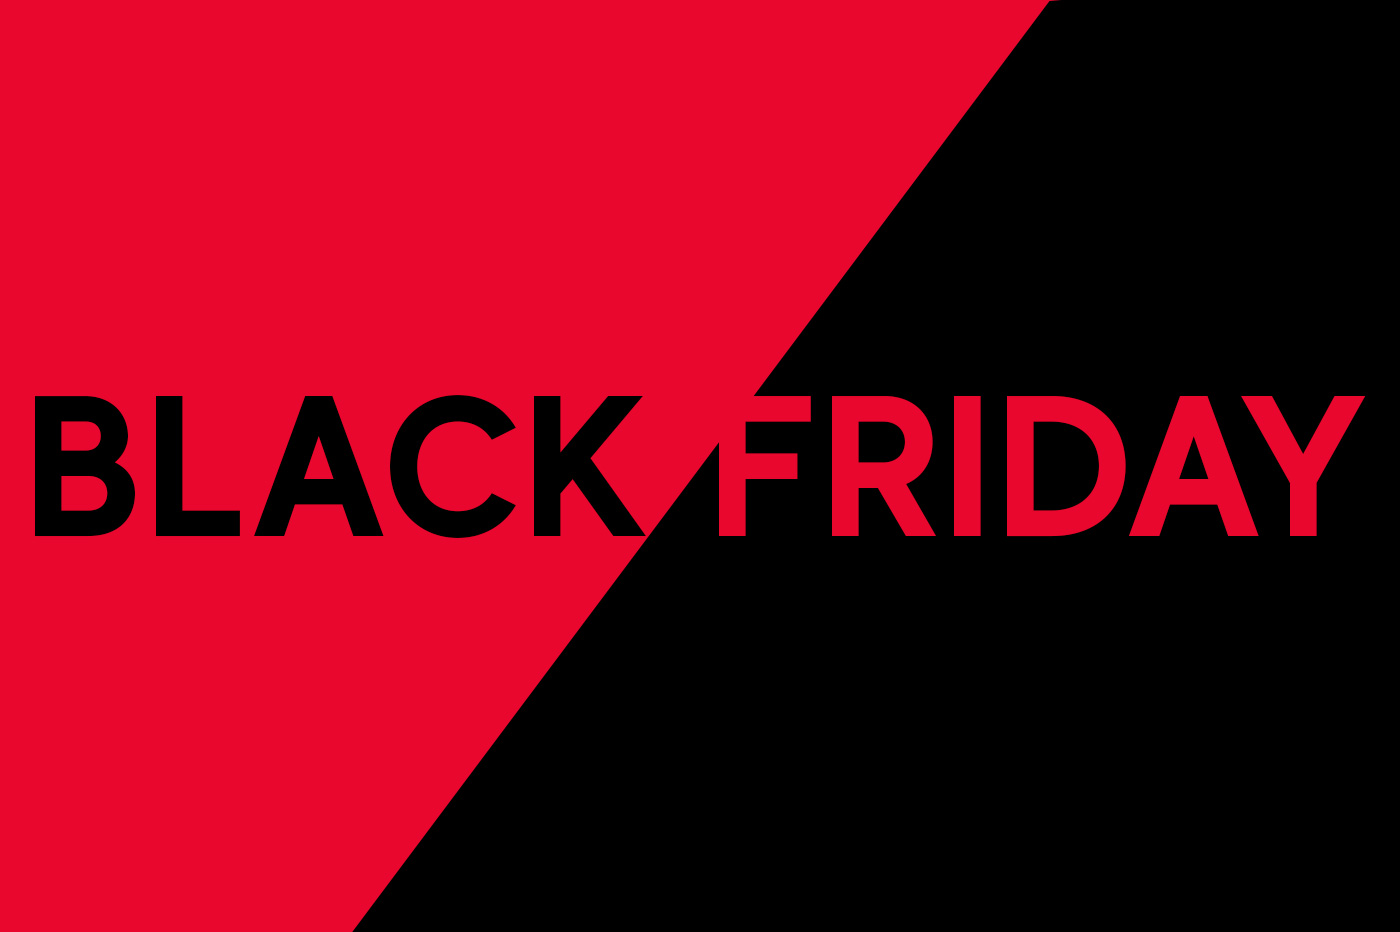 Black Friday iPhon